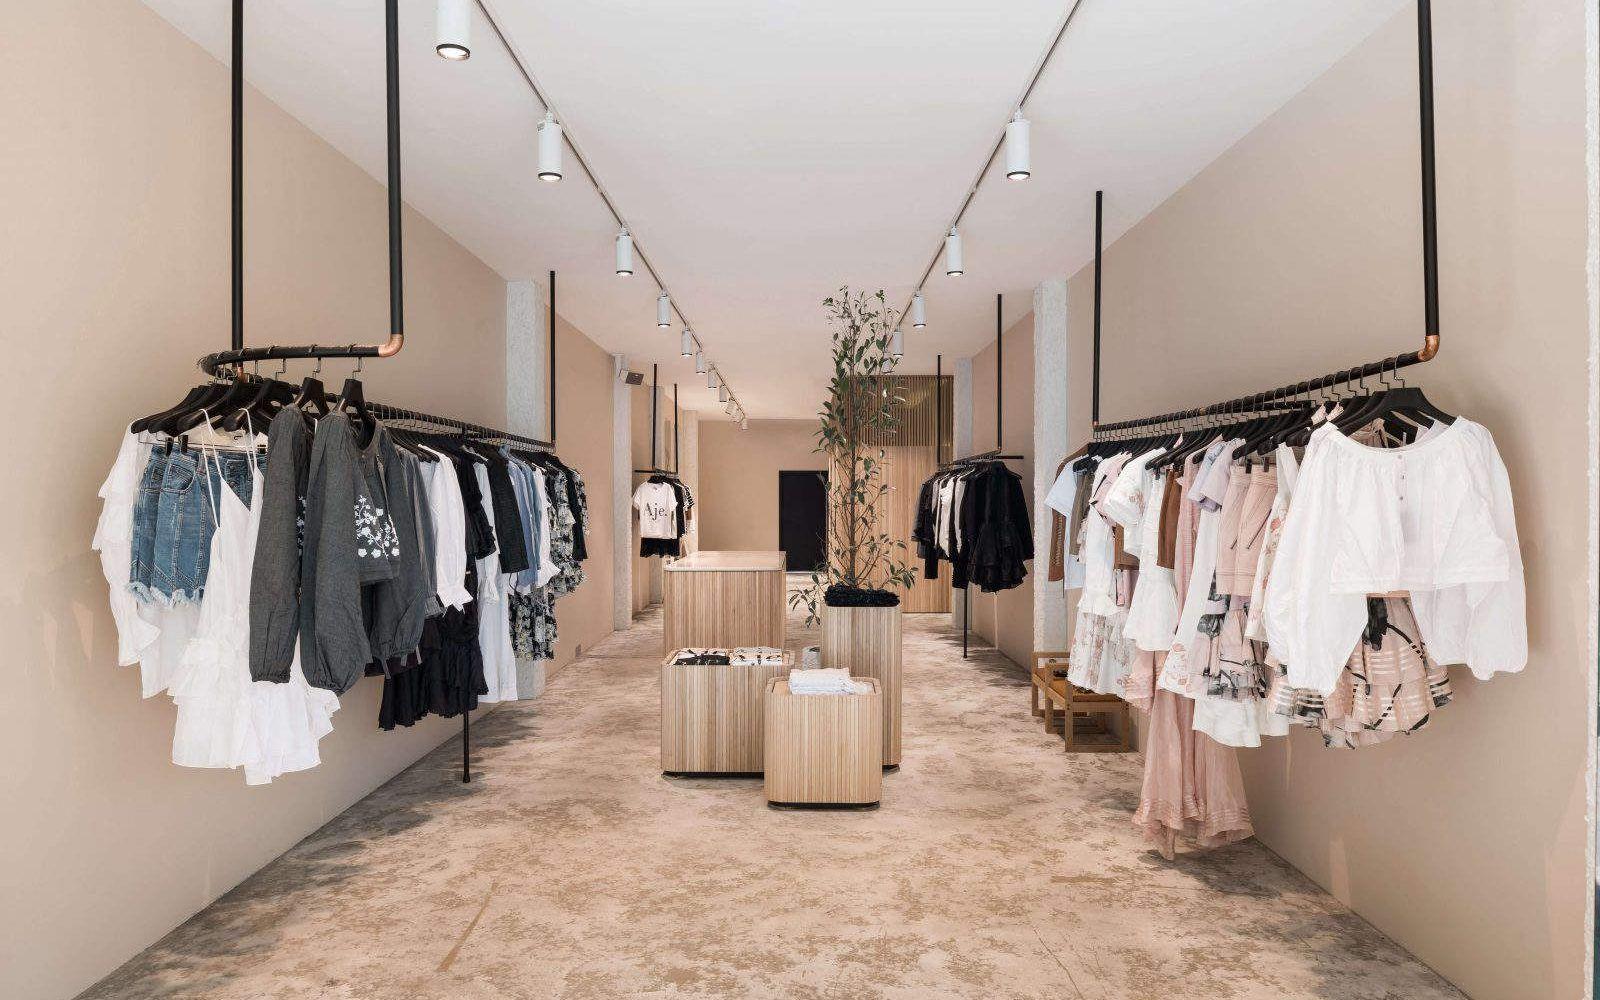 fashion store interior design ideas pictures